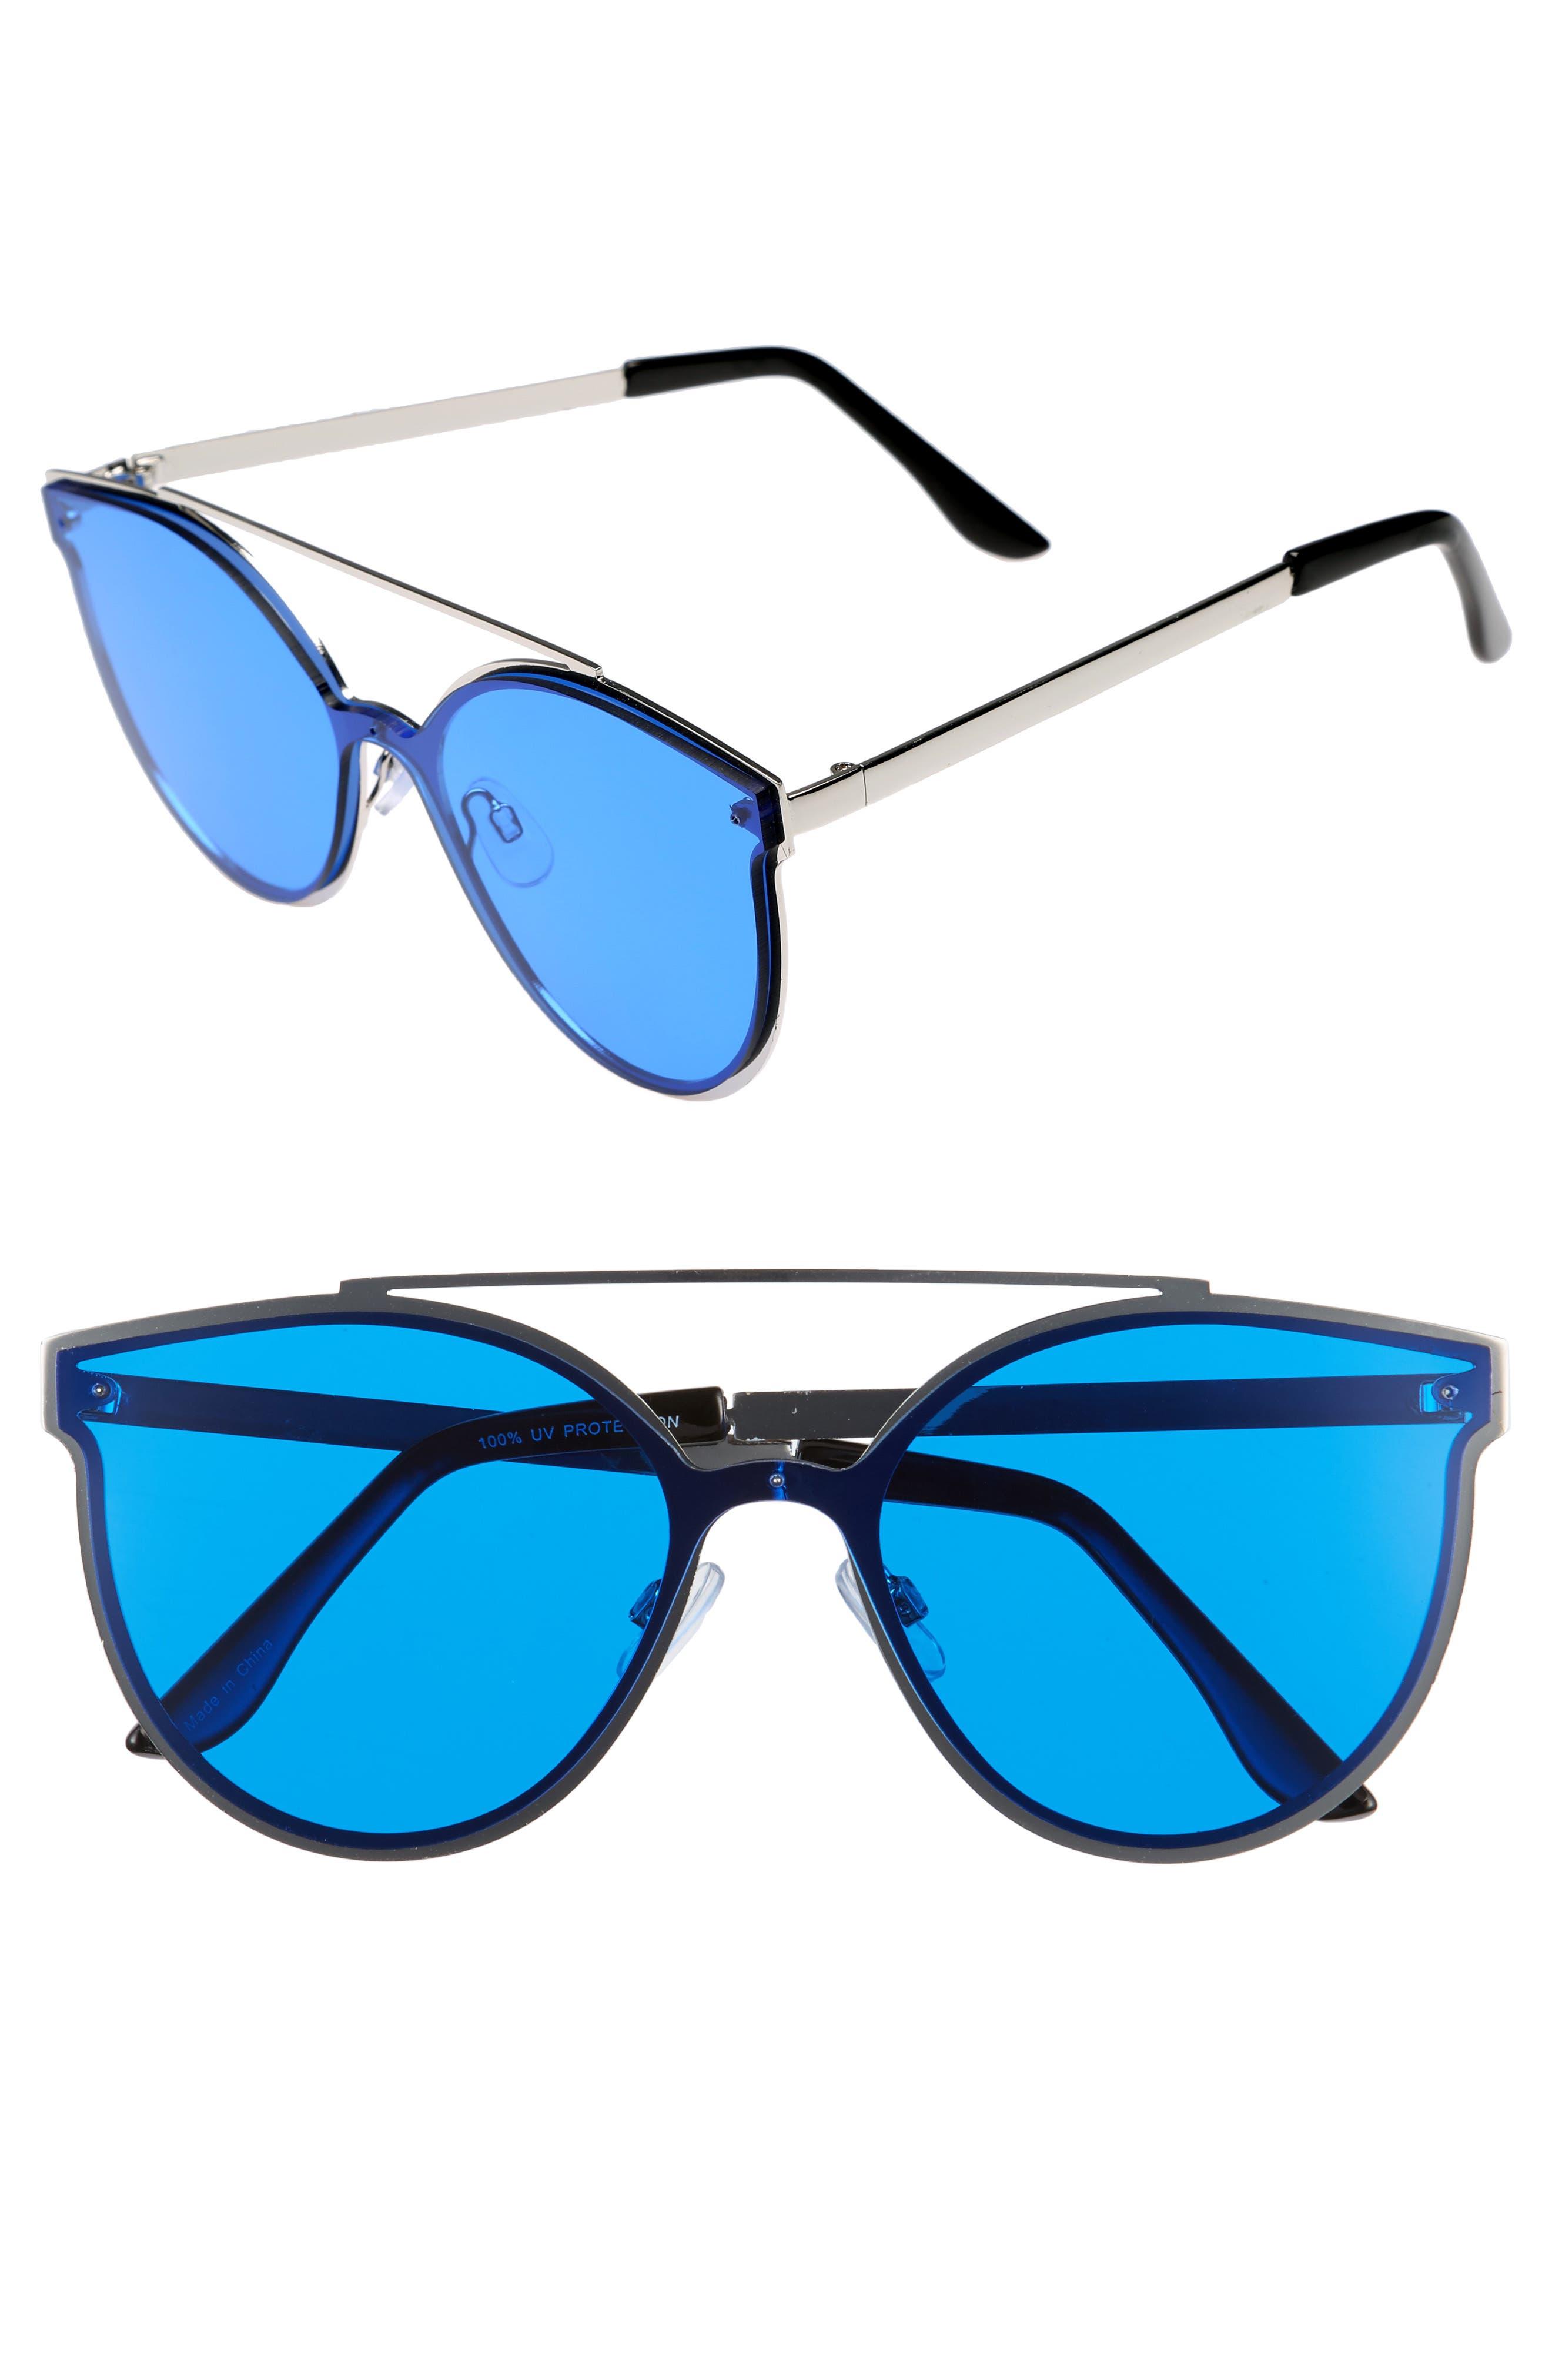 58mm Brow Bar Sunglasses,                             Main thumbnail 1, color,                             400